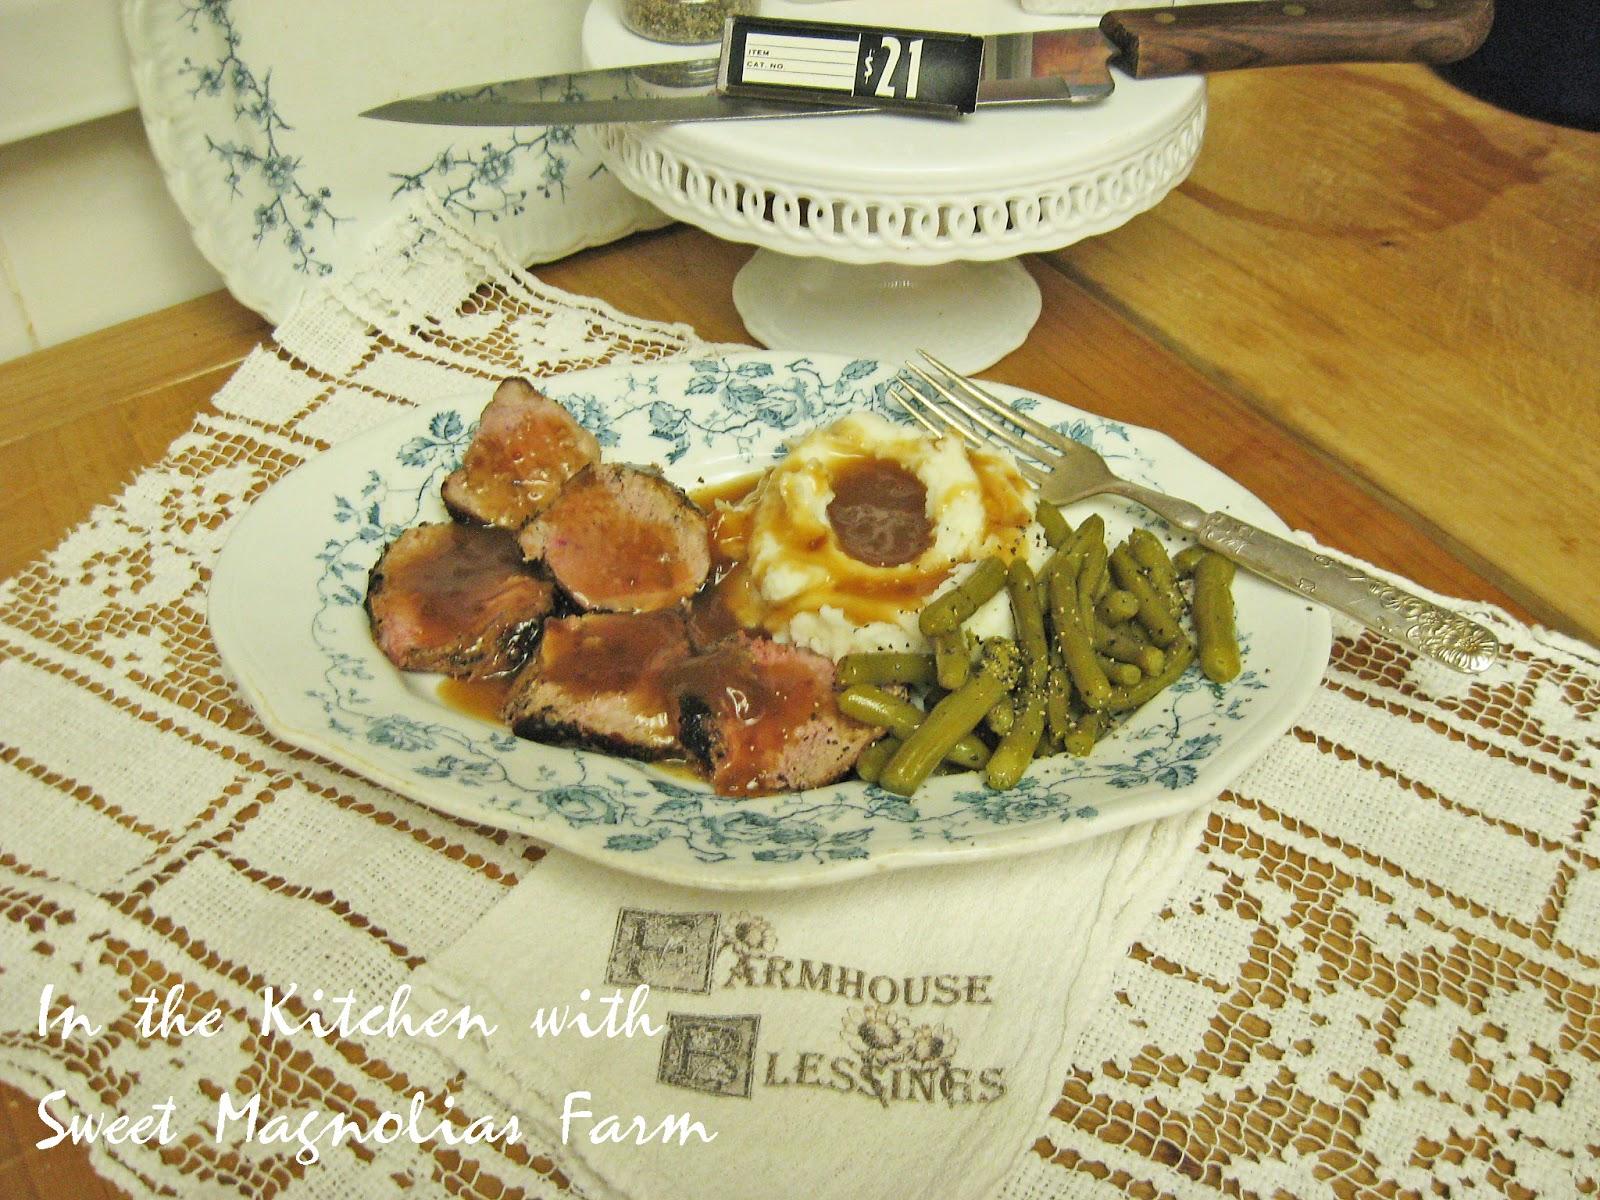 Sweet Magnolias Farm Pork Tenderloin Roast Good Old Fashioned Cooking &q